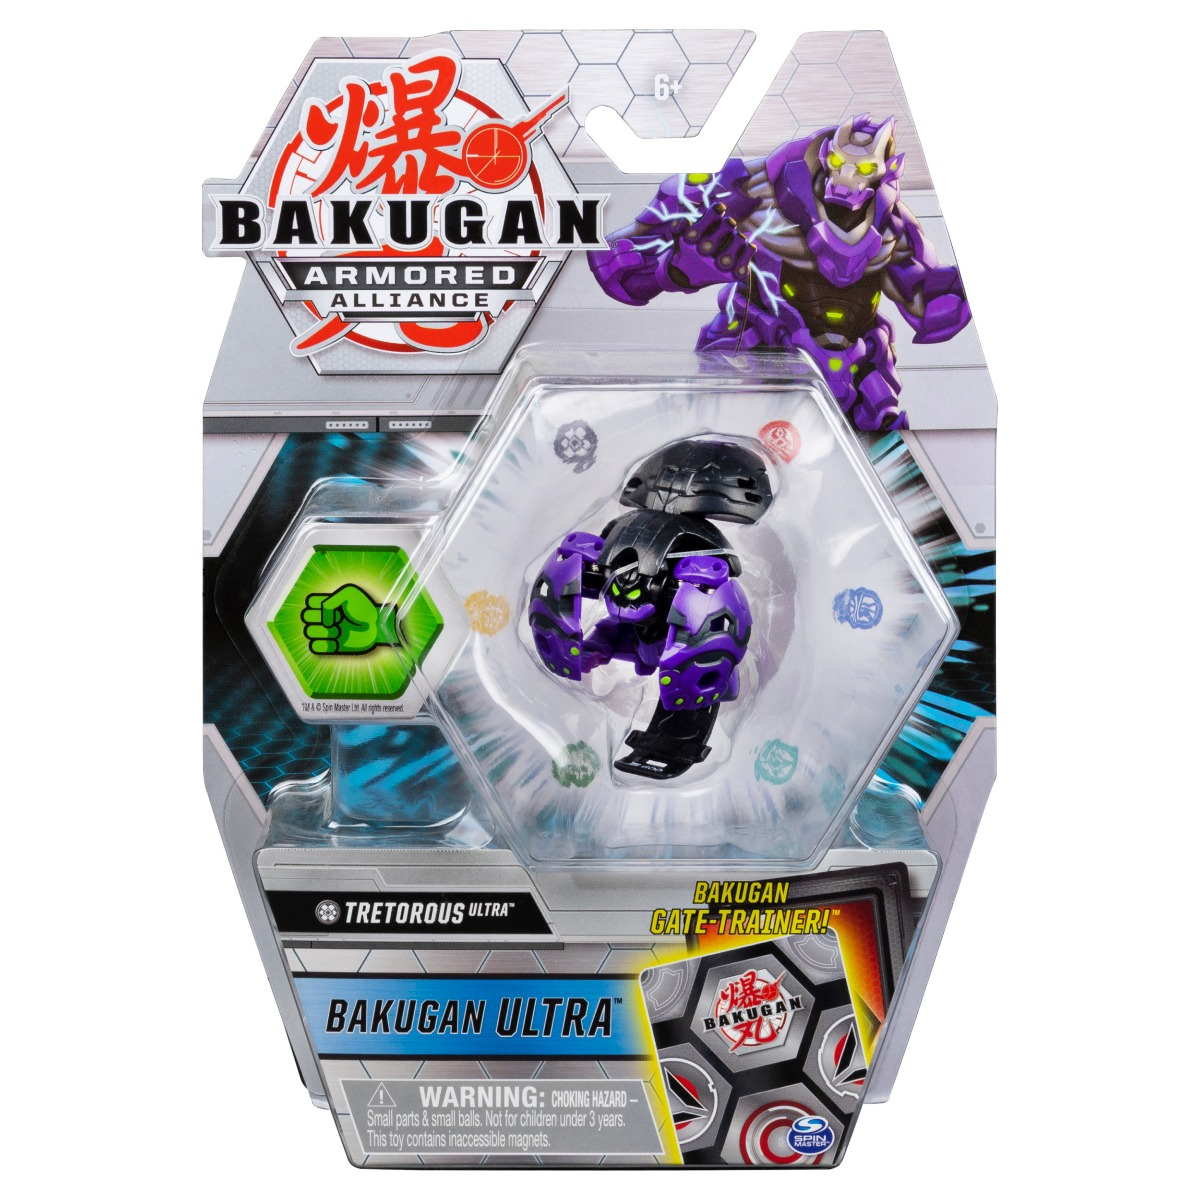 Figurina Bakugan Ultra Armored Alliance, Tretorous, 20124150